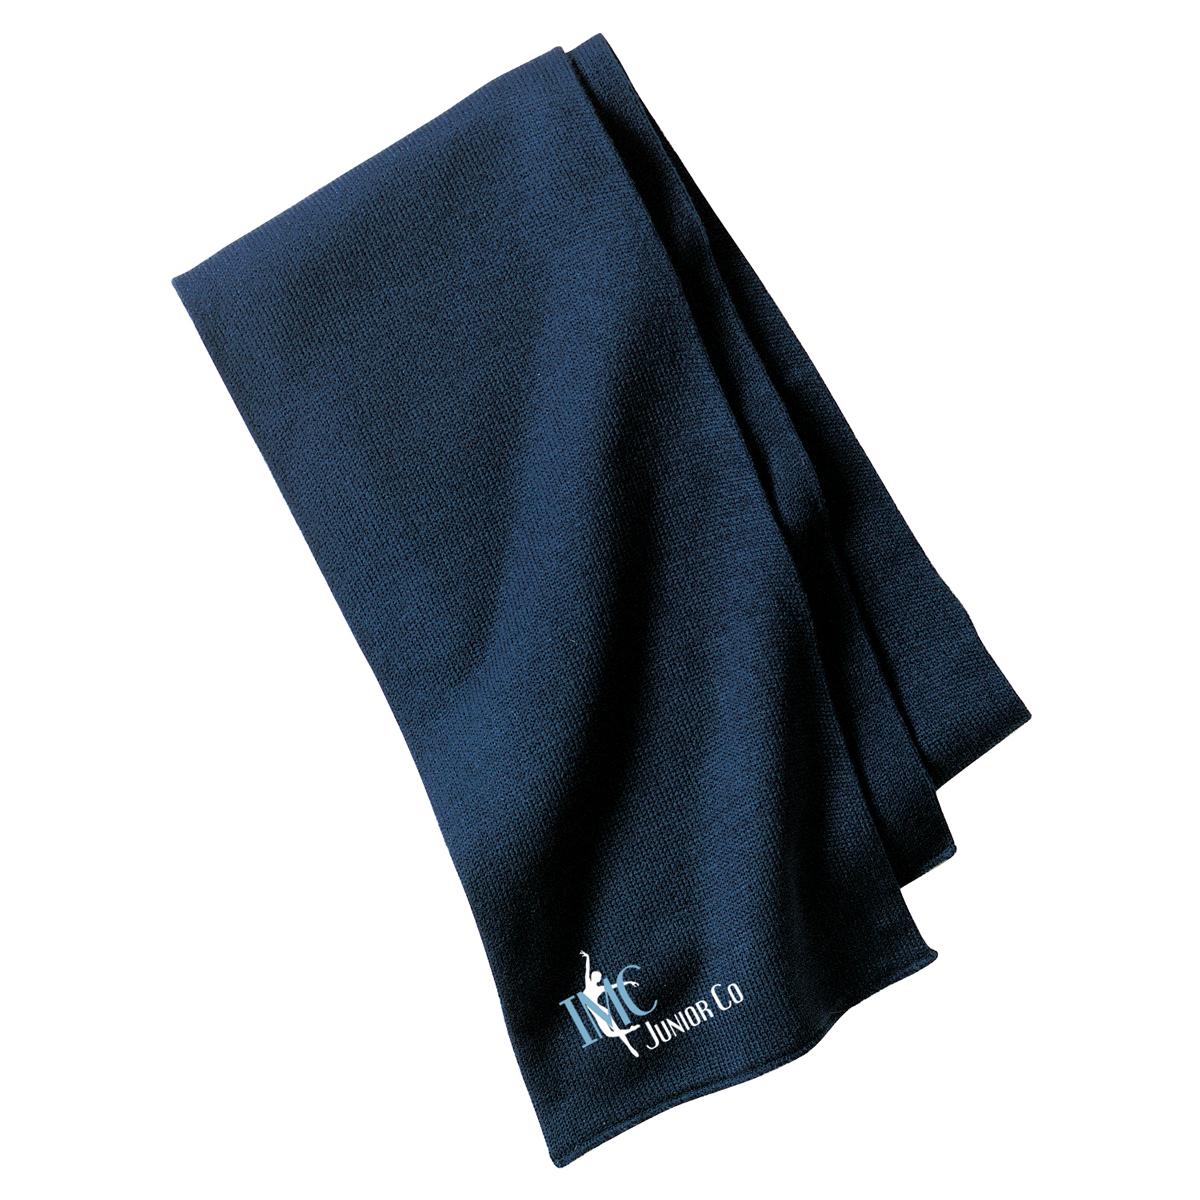 IMC Jr. Company - Knit Scarf